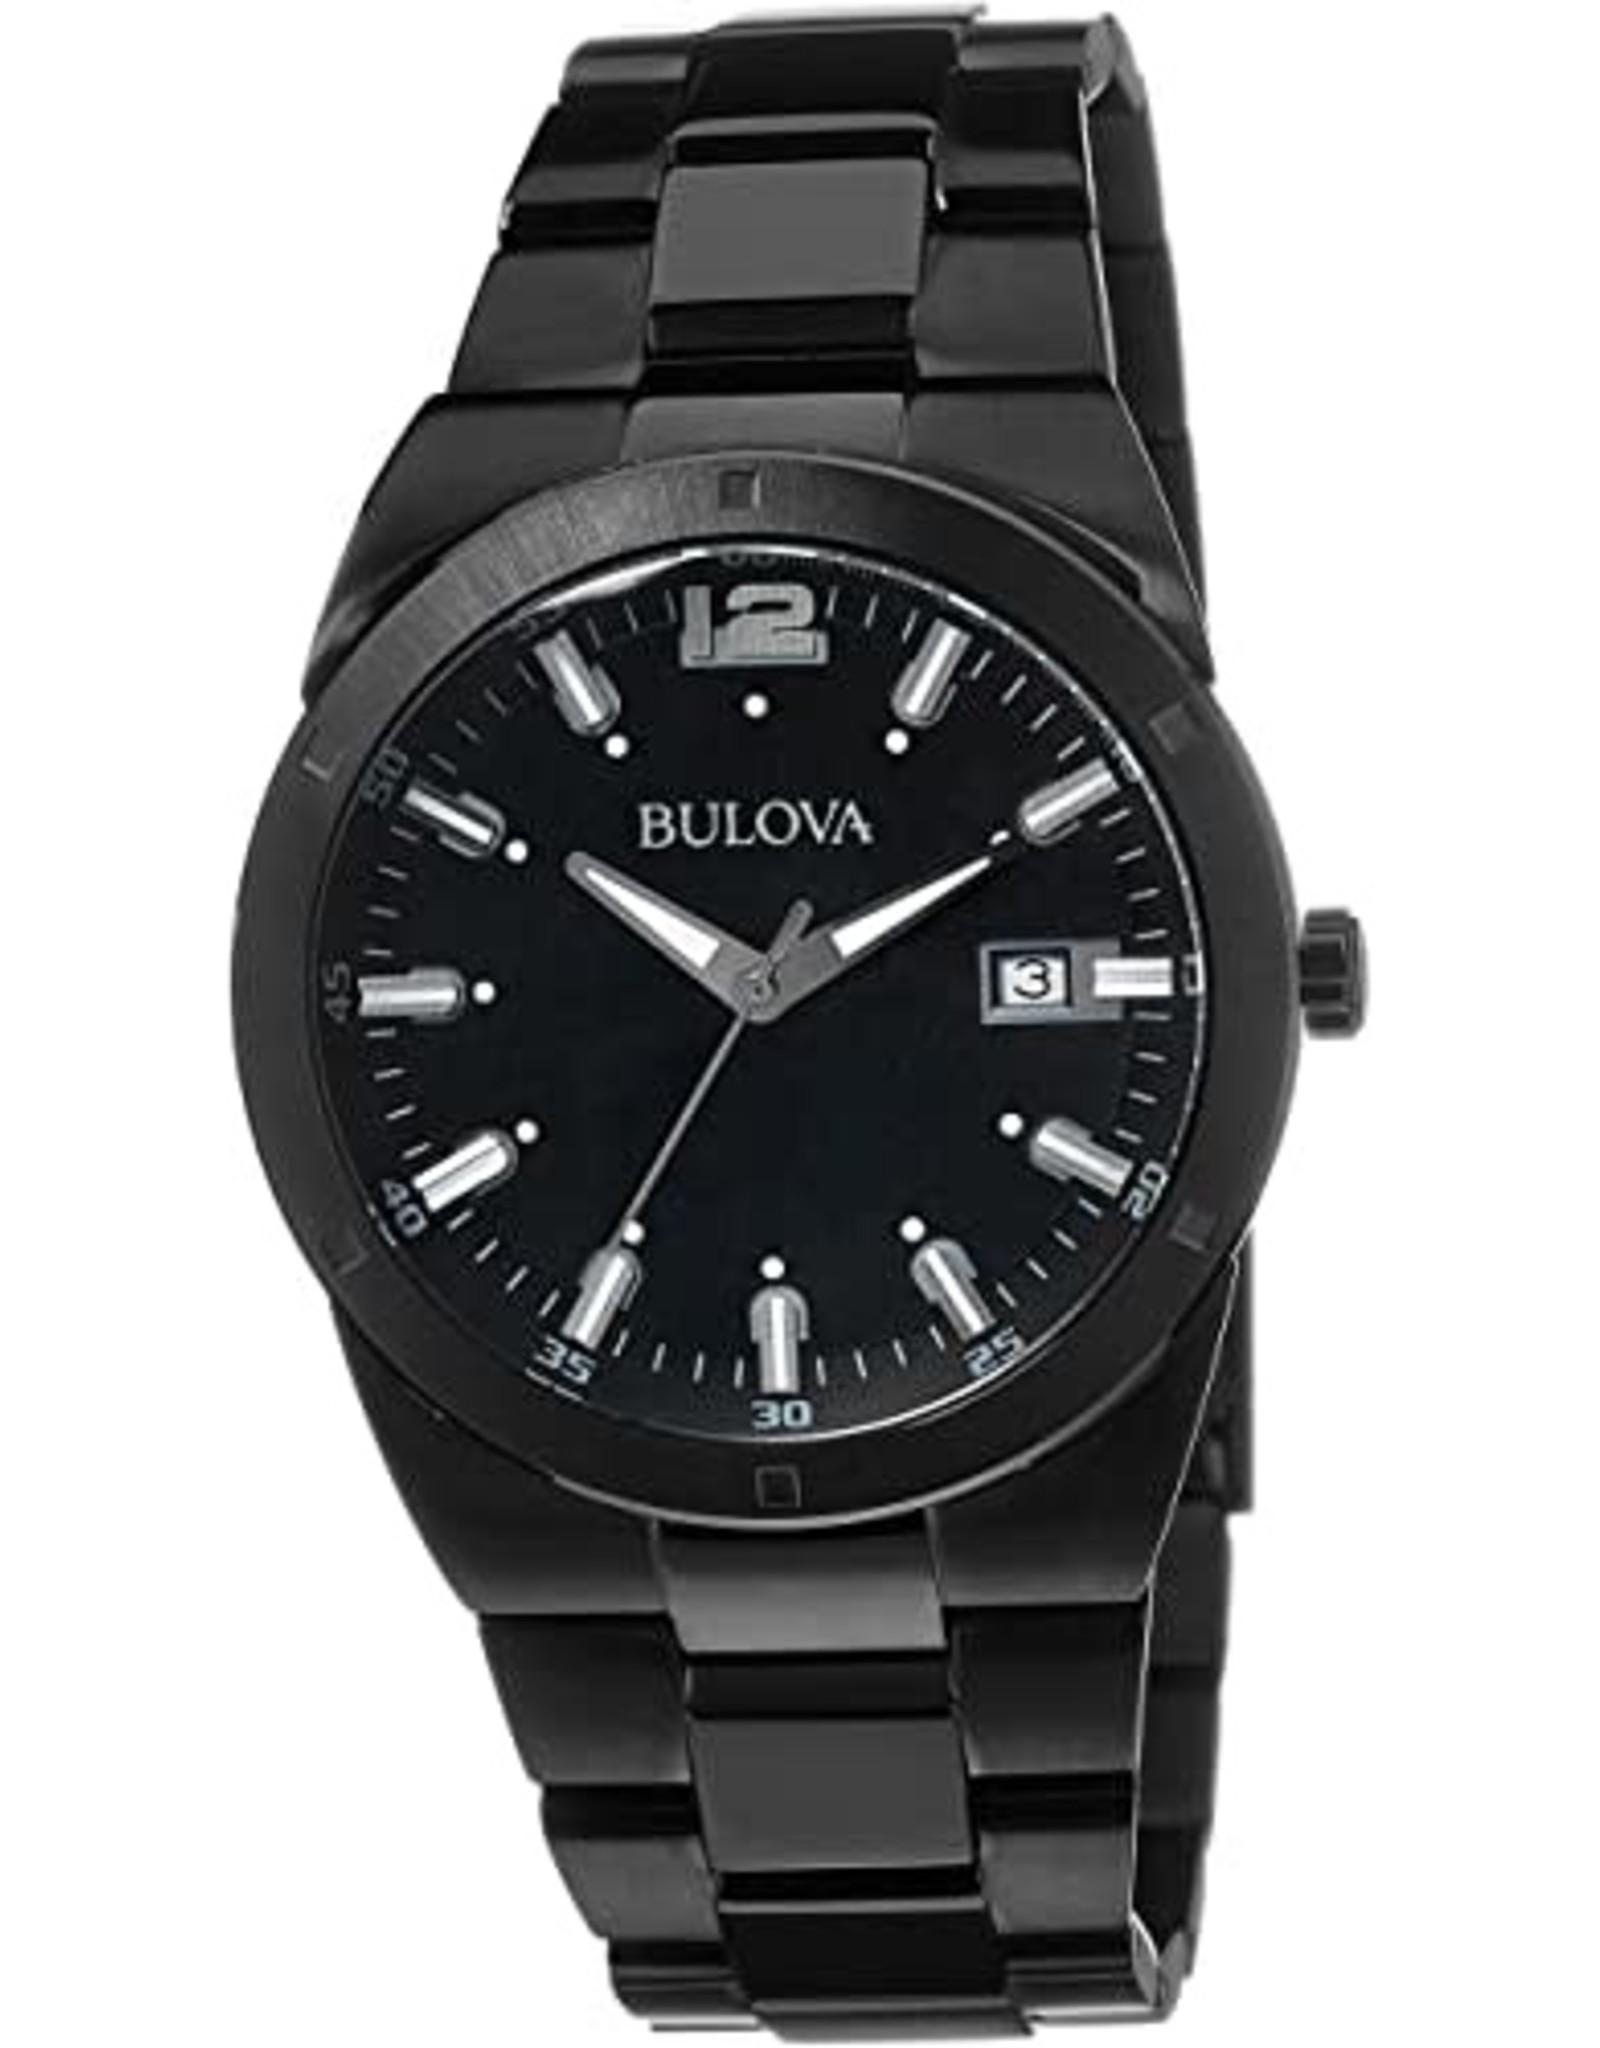 Men's Bulova Black Classic Display Watch